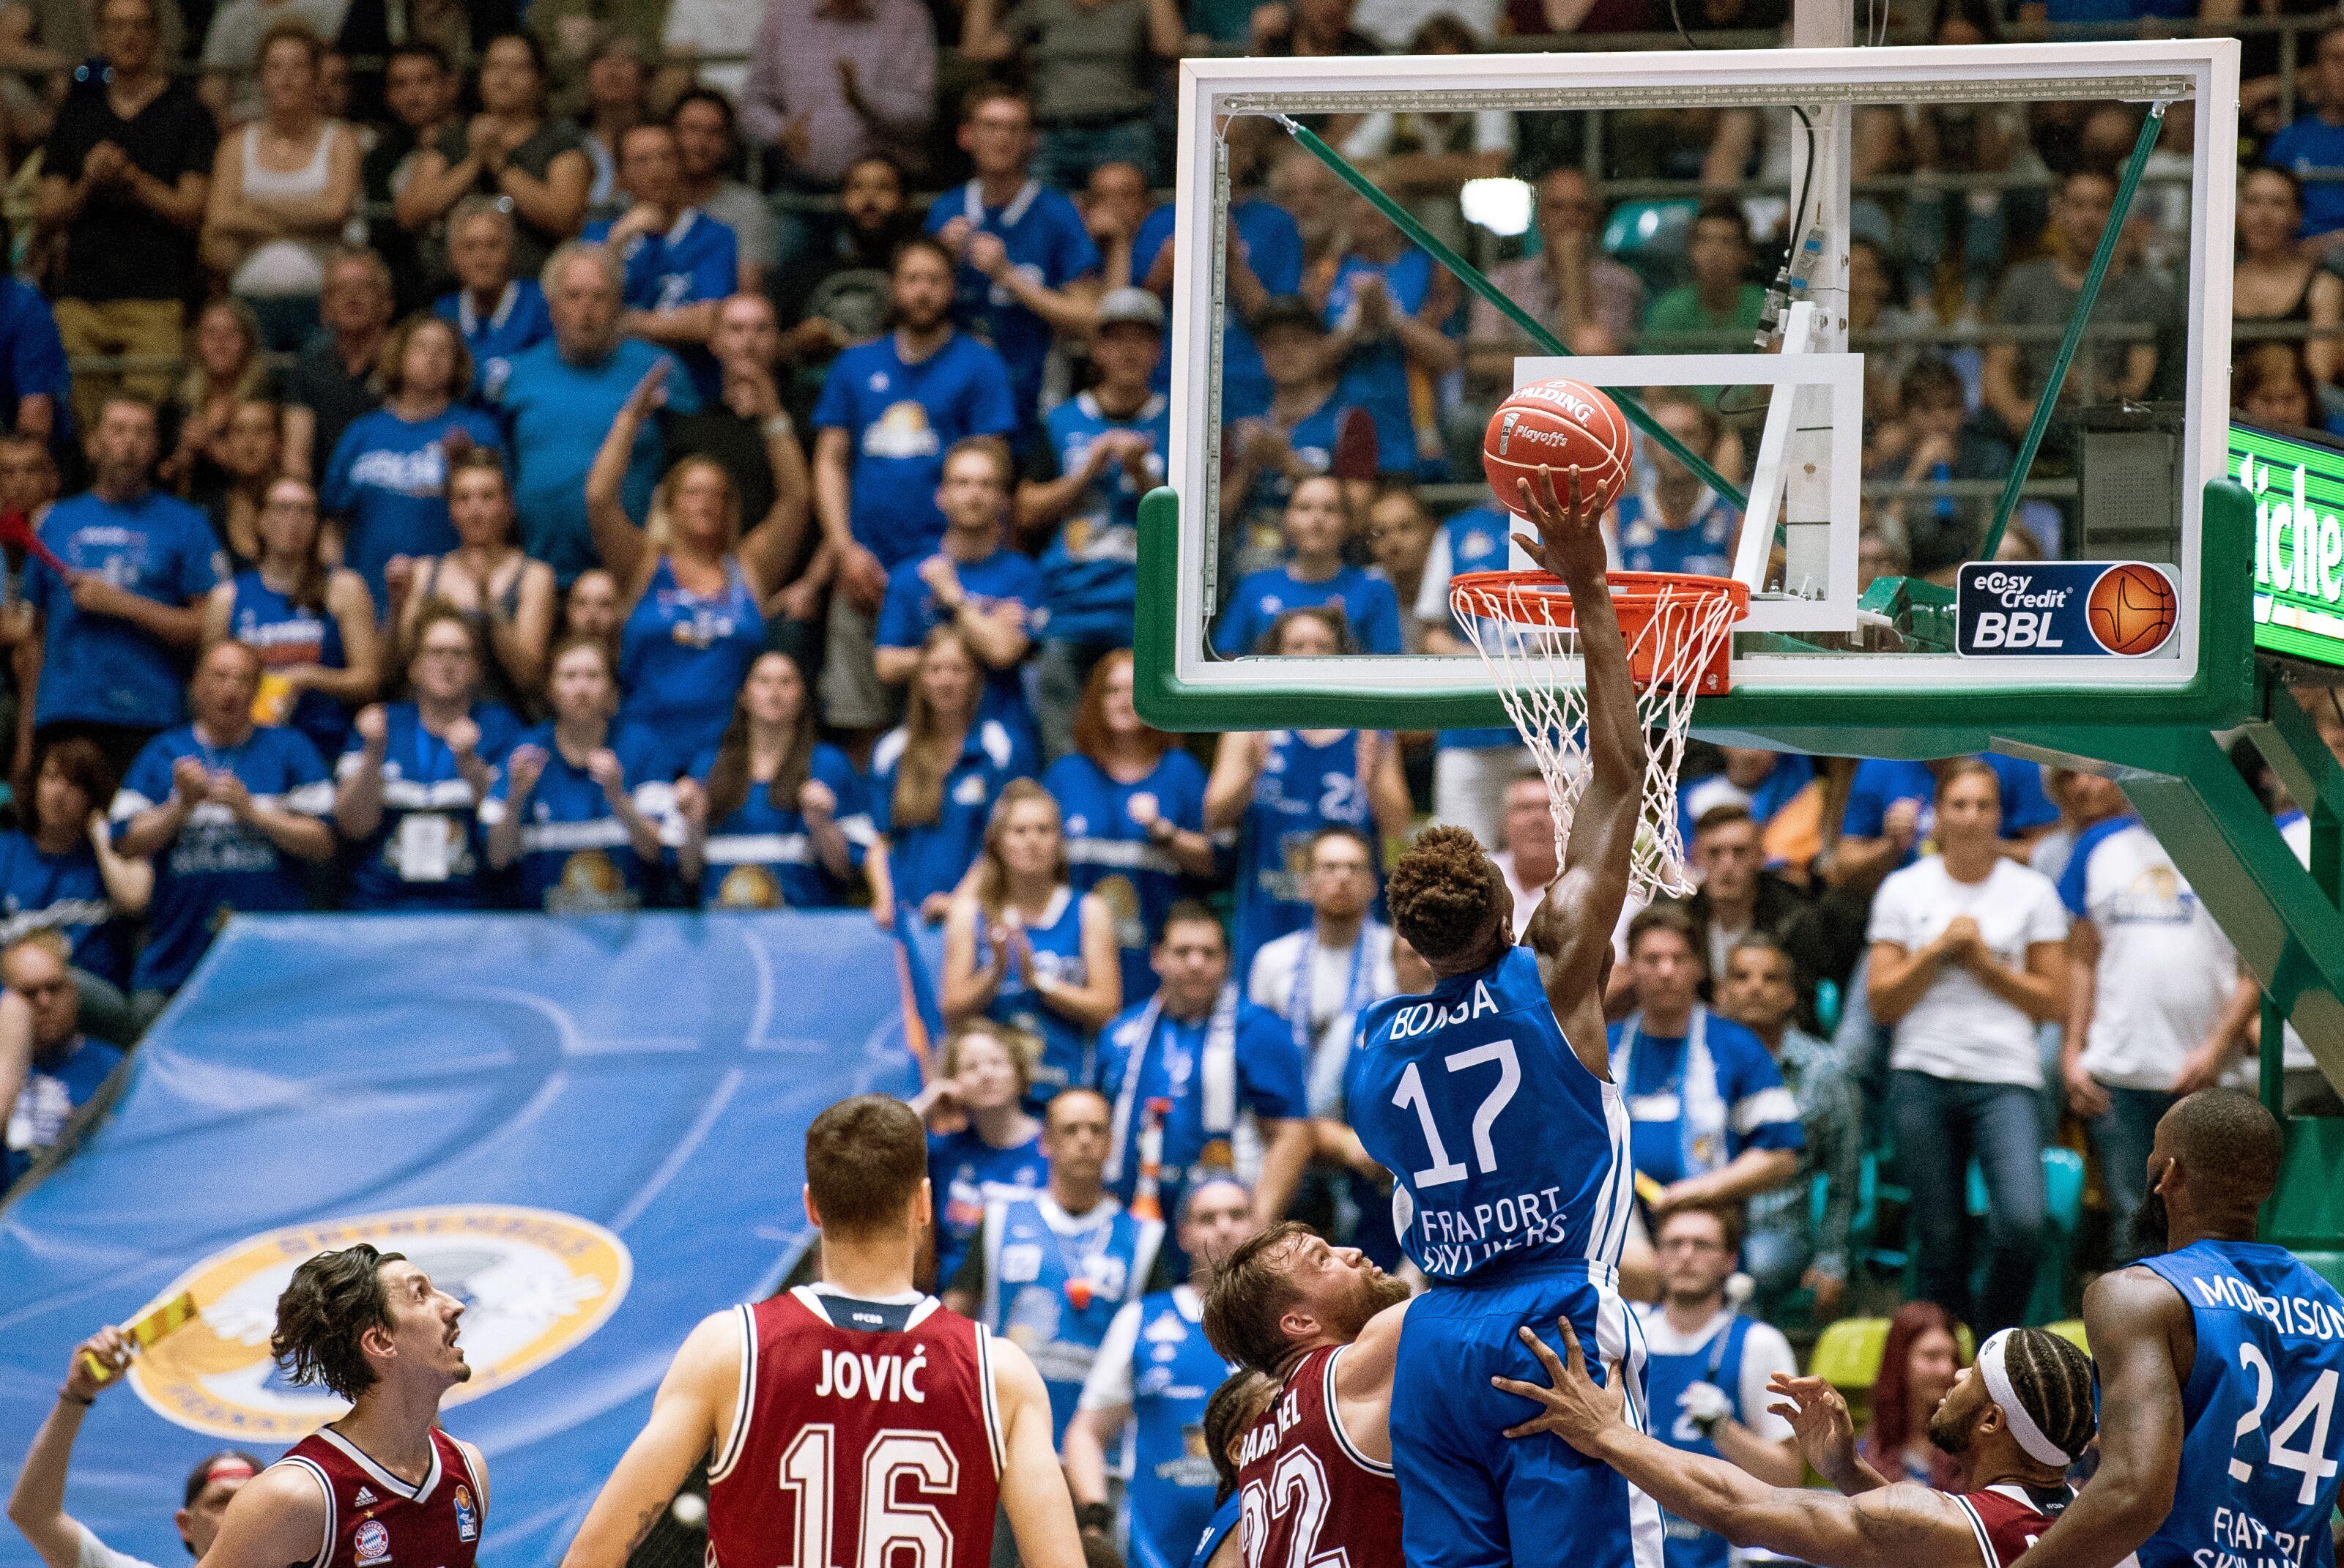 NBA Draft: Isaac Bonga needs more time to develop